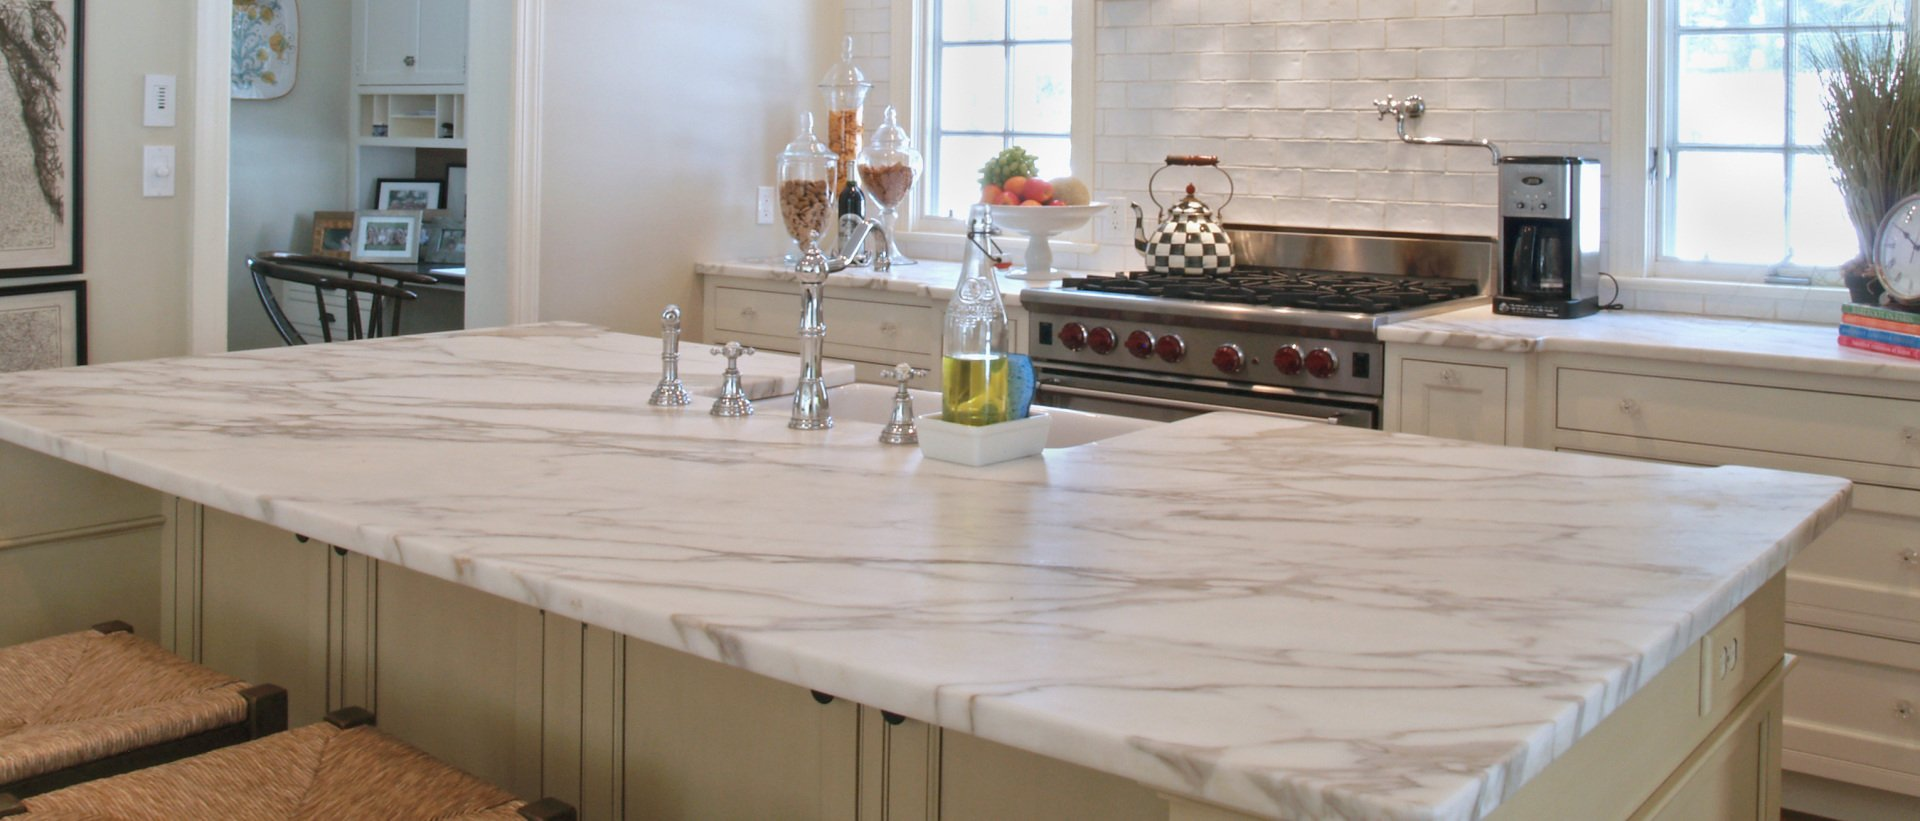 Kitchen Countertops San Francisco Ca Floorcraft